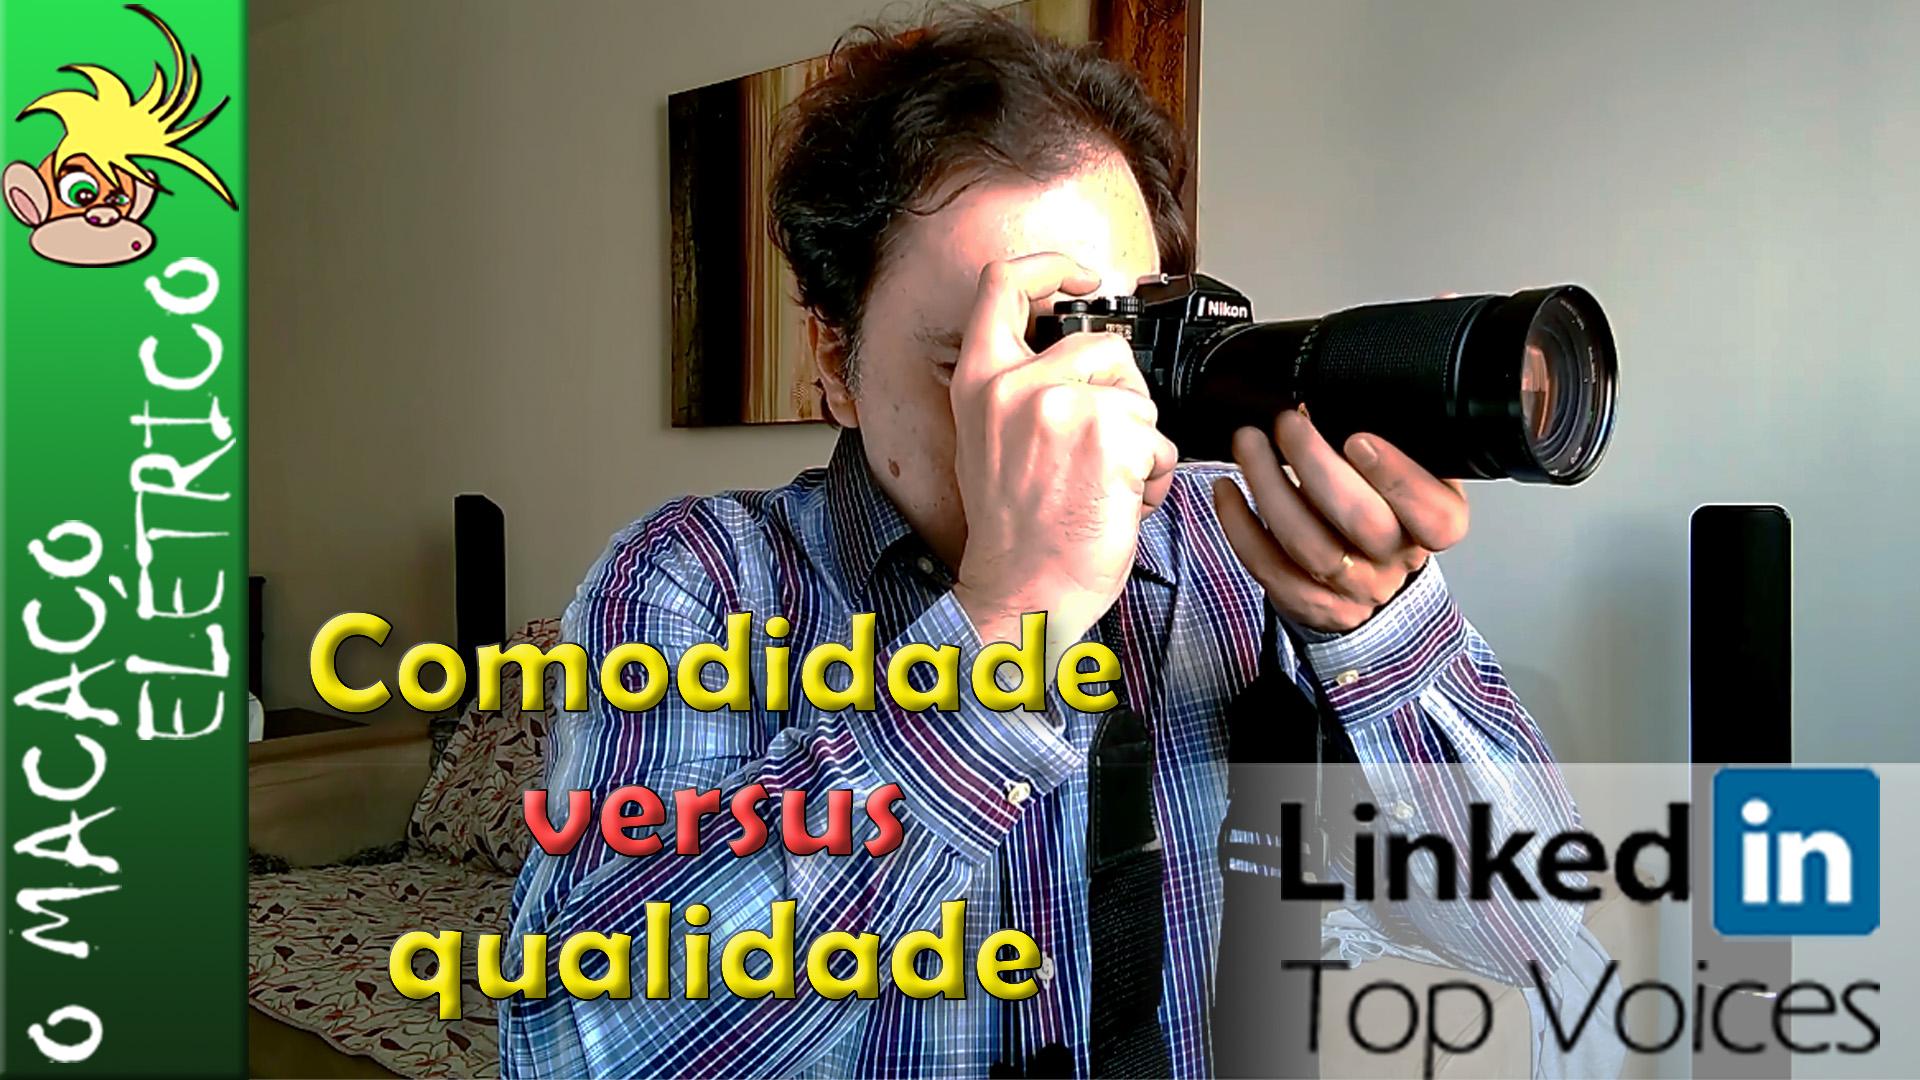 Videodebate: comodidade versus qualidade